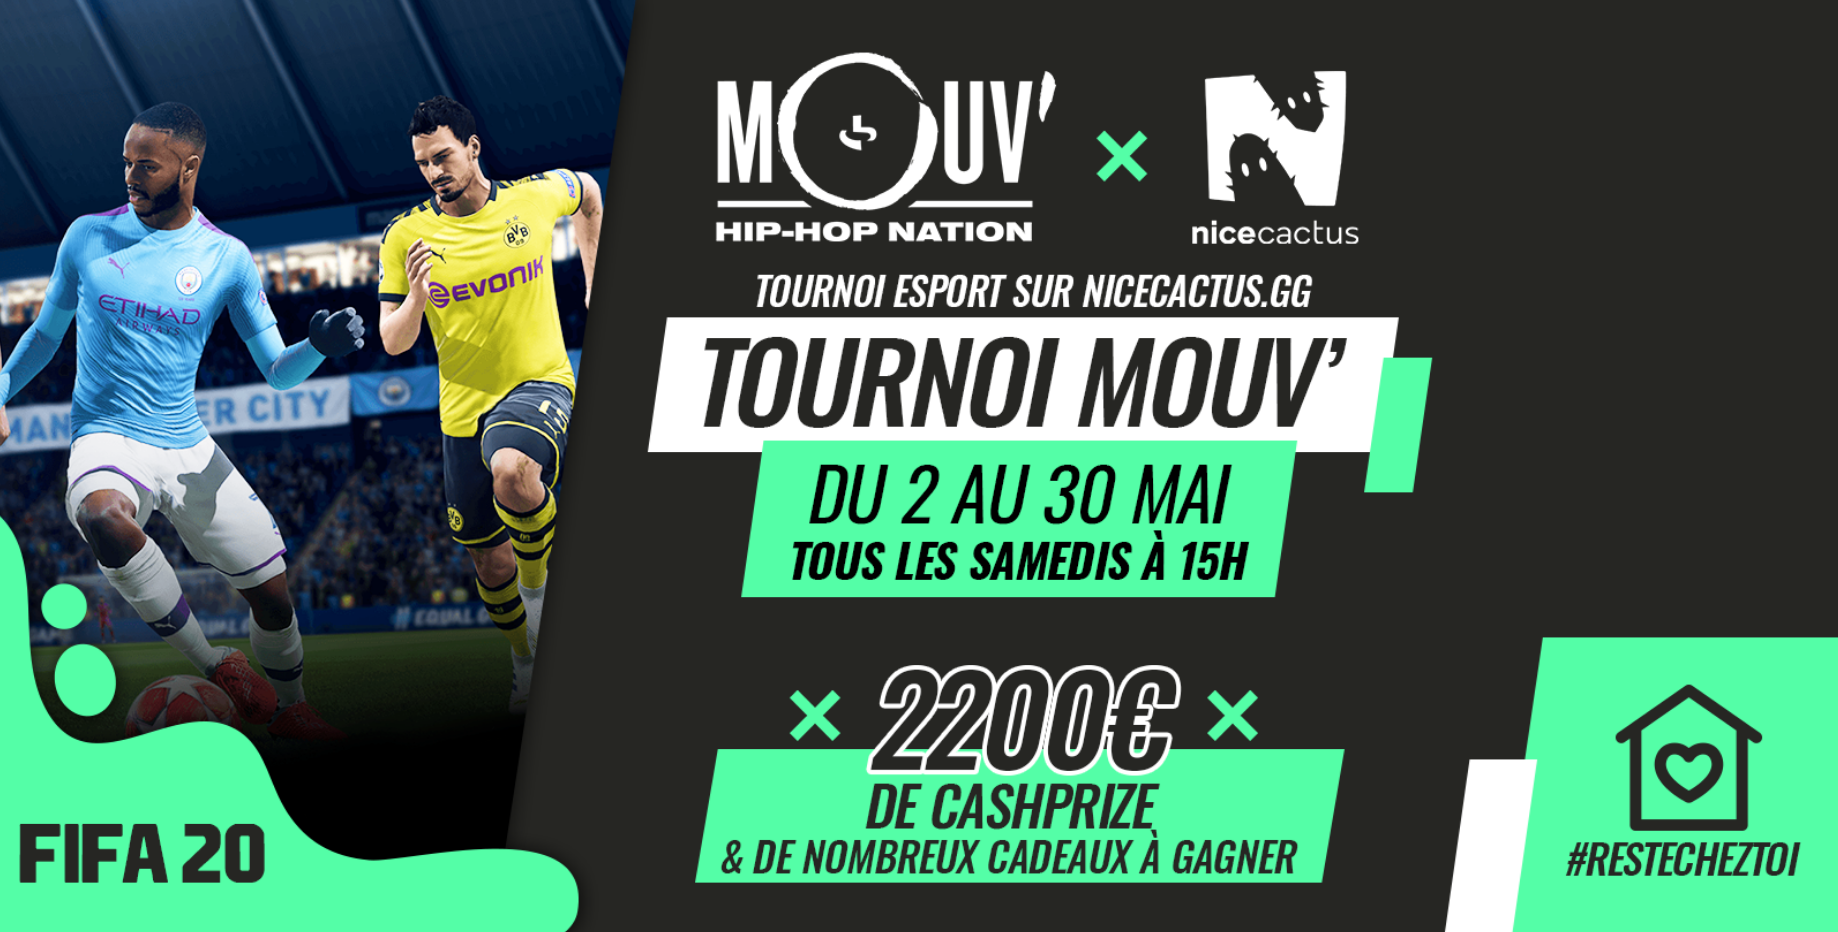 Mouv' lance son premier tournoi e-sport avec Nicecactus